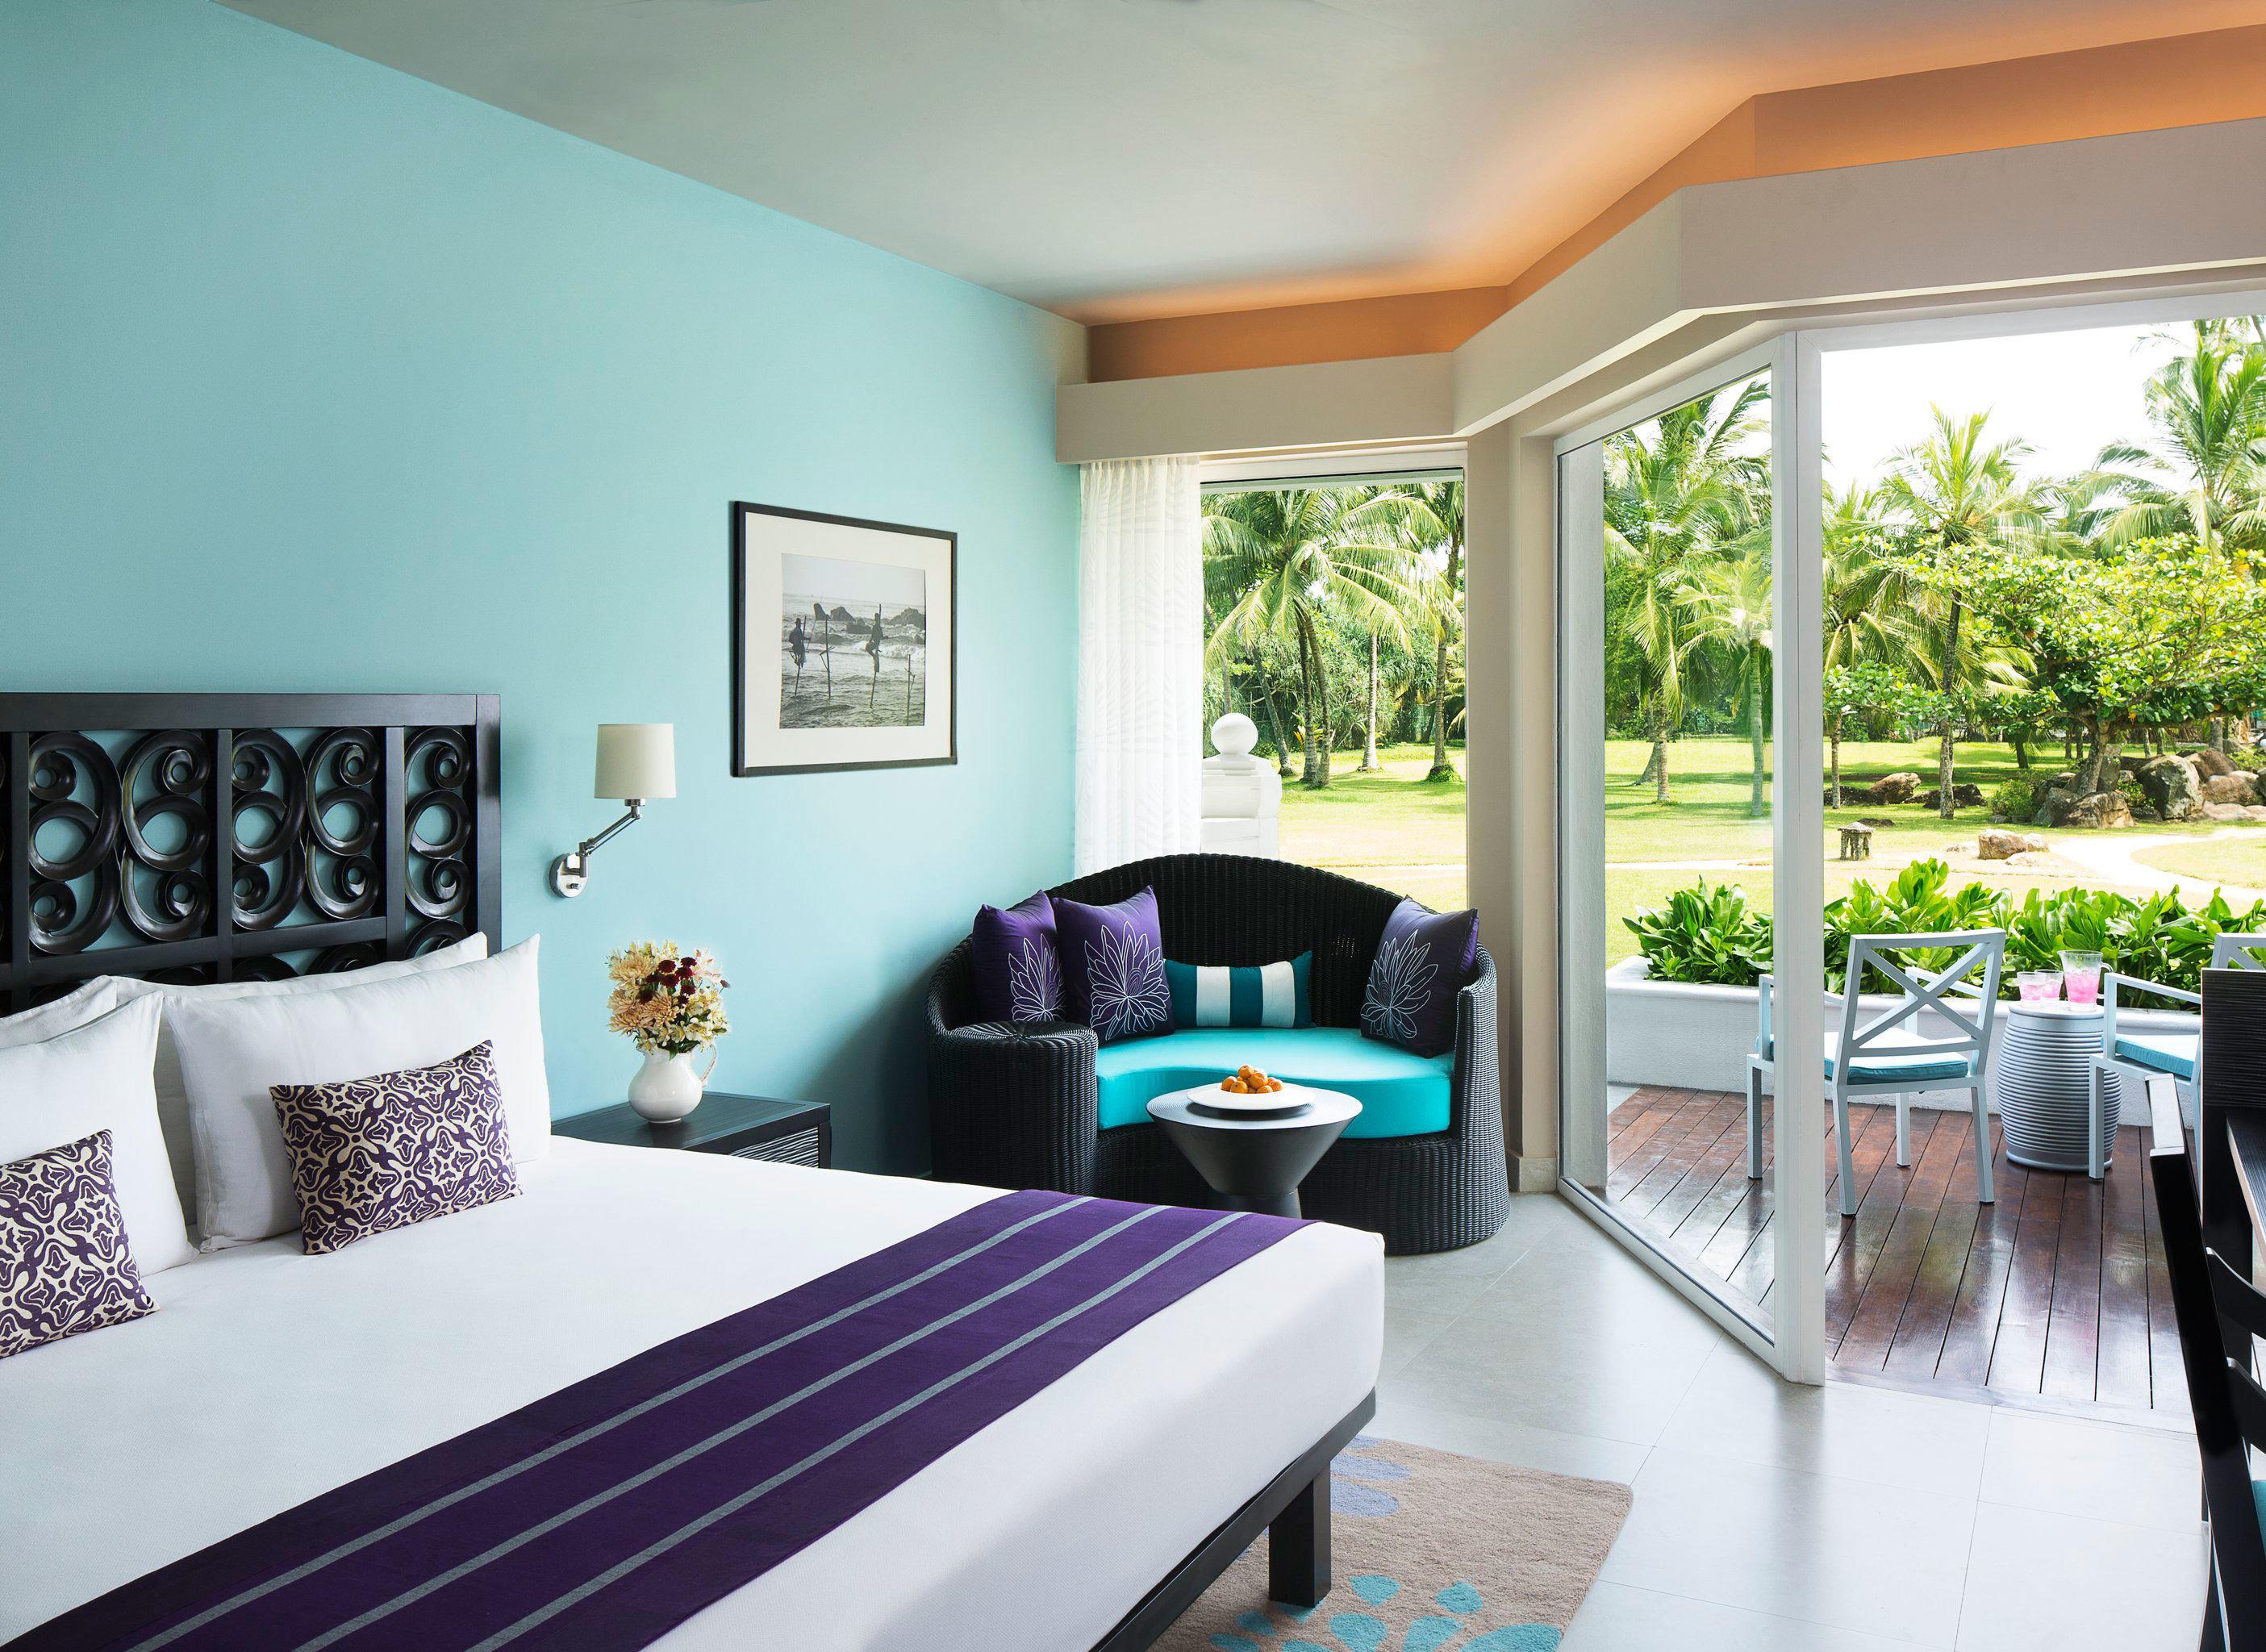 Bedroom Modern Resort Scenic views property home white living room condominium Villa cottage